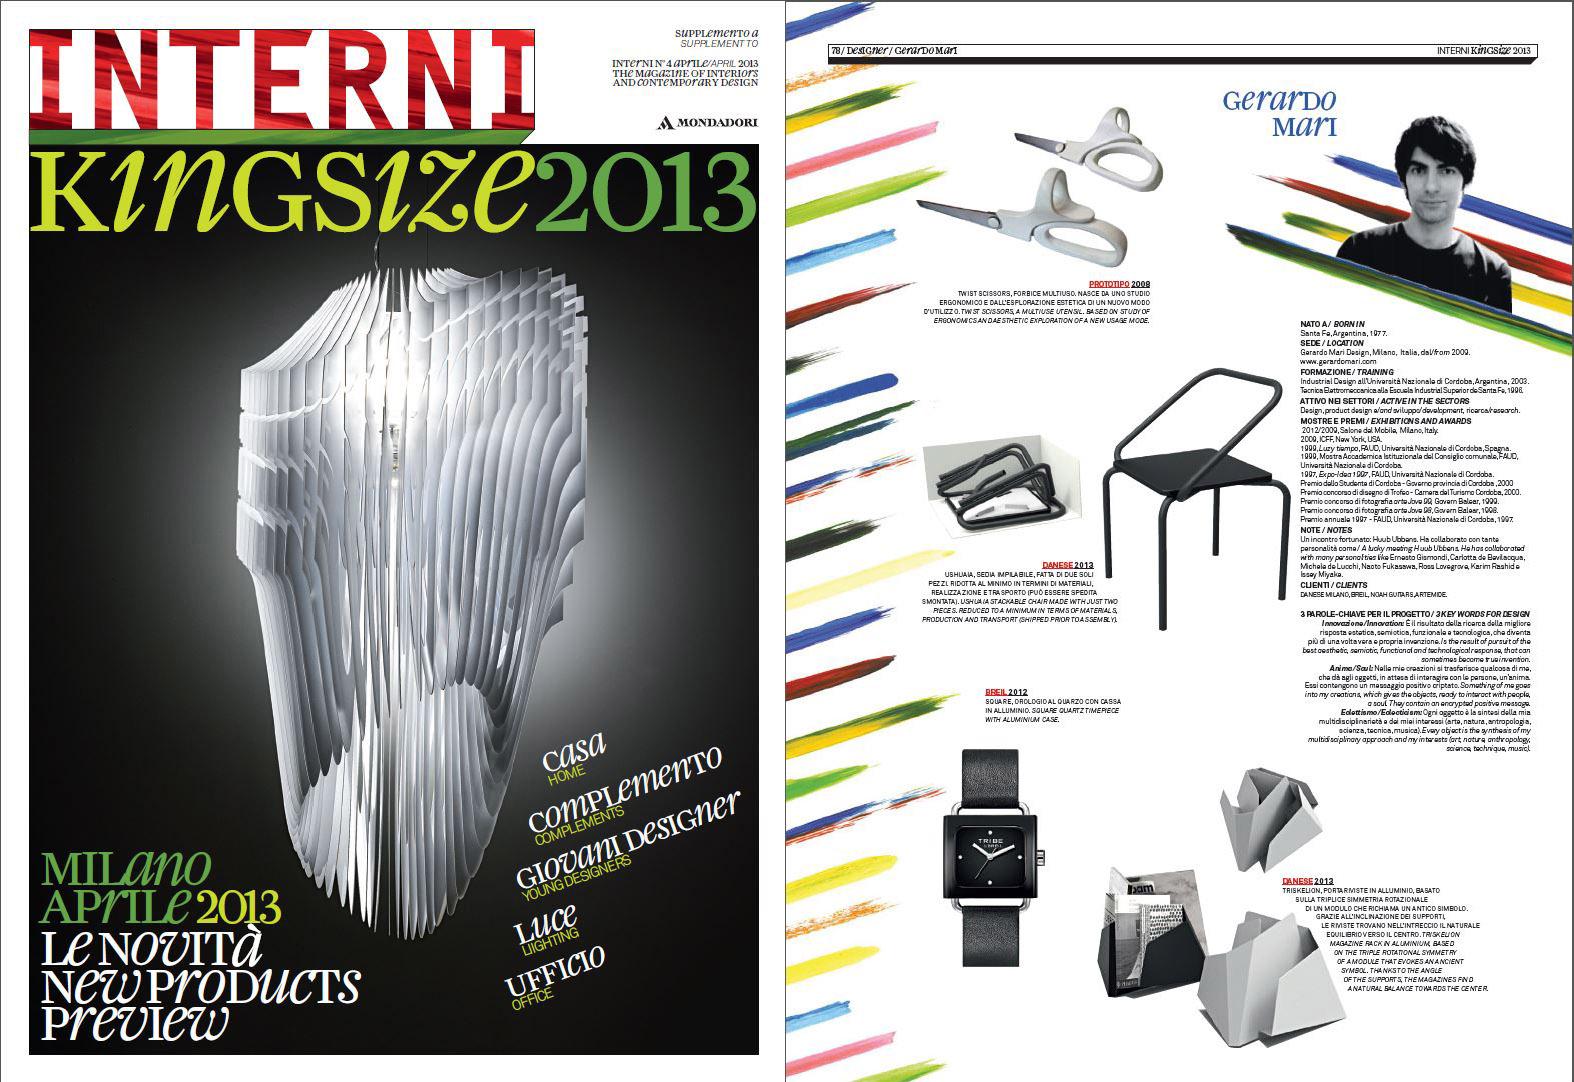 Interni King Size - April 2013 - Italy - Twist Scissors - Ushuaia - Square - Triskelion